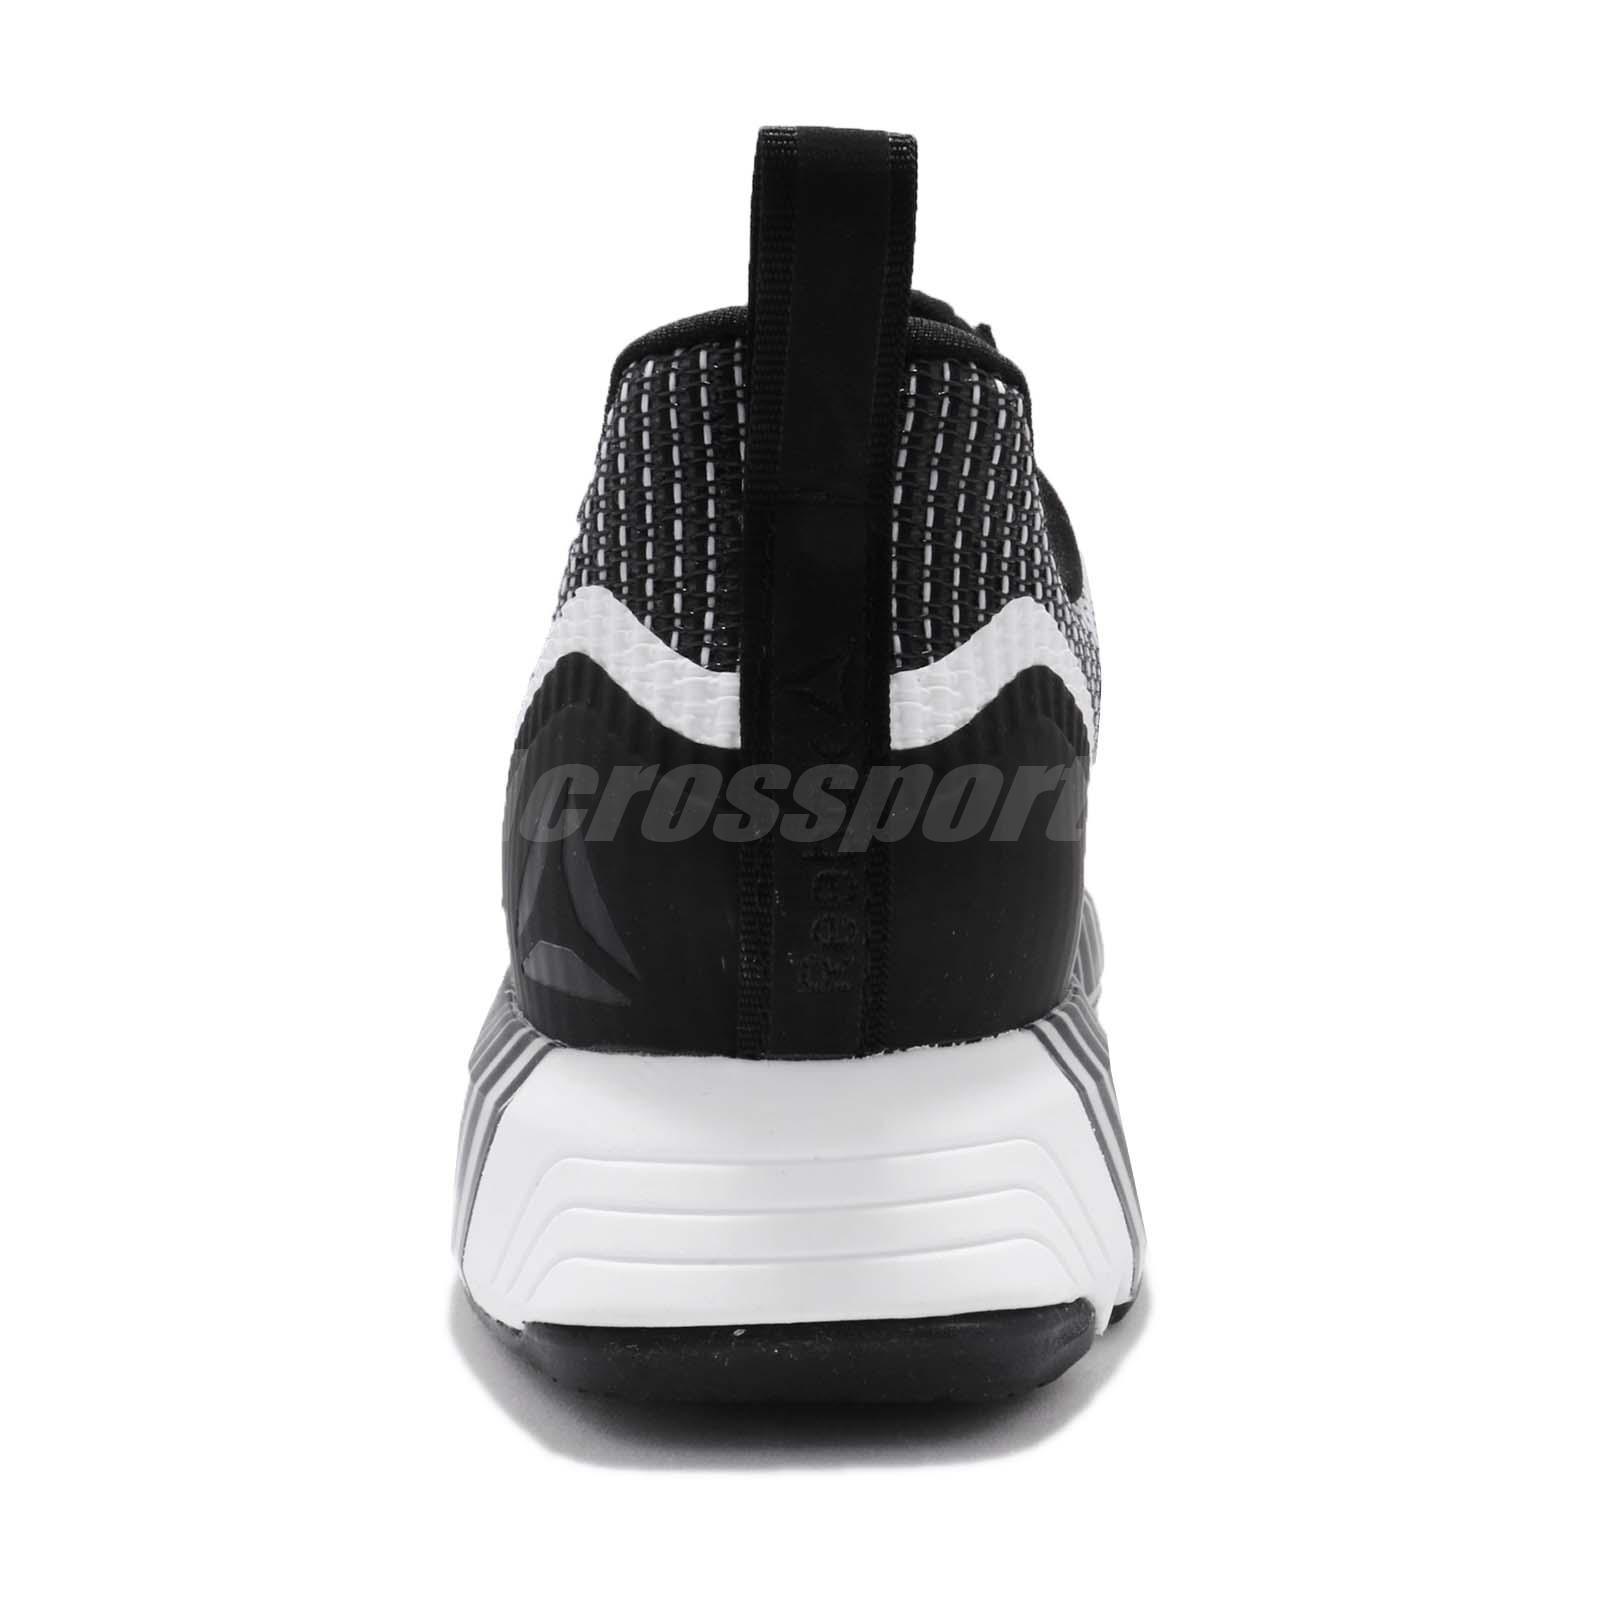 ea0659598d1 Reebok Fusion Flexweave Floatride Black White Men Running Shoes ...